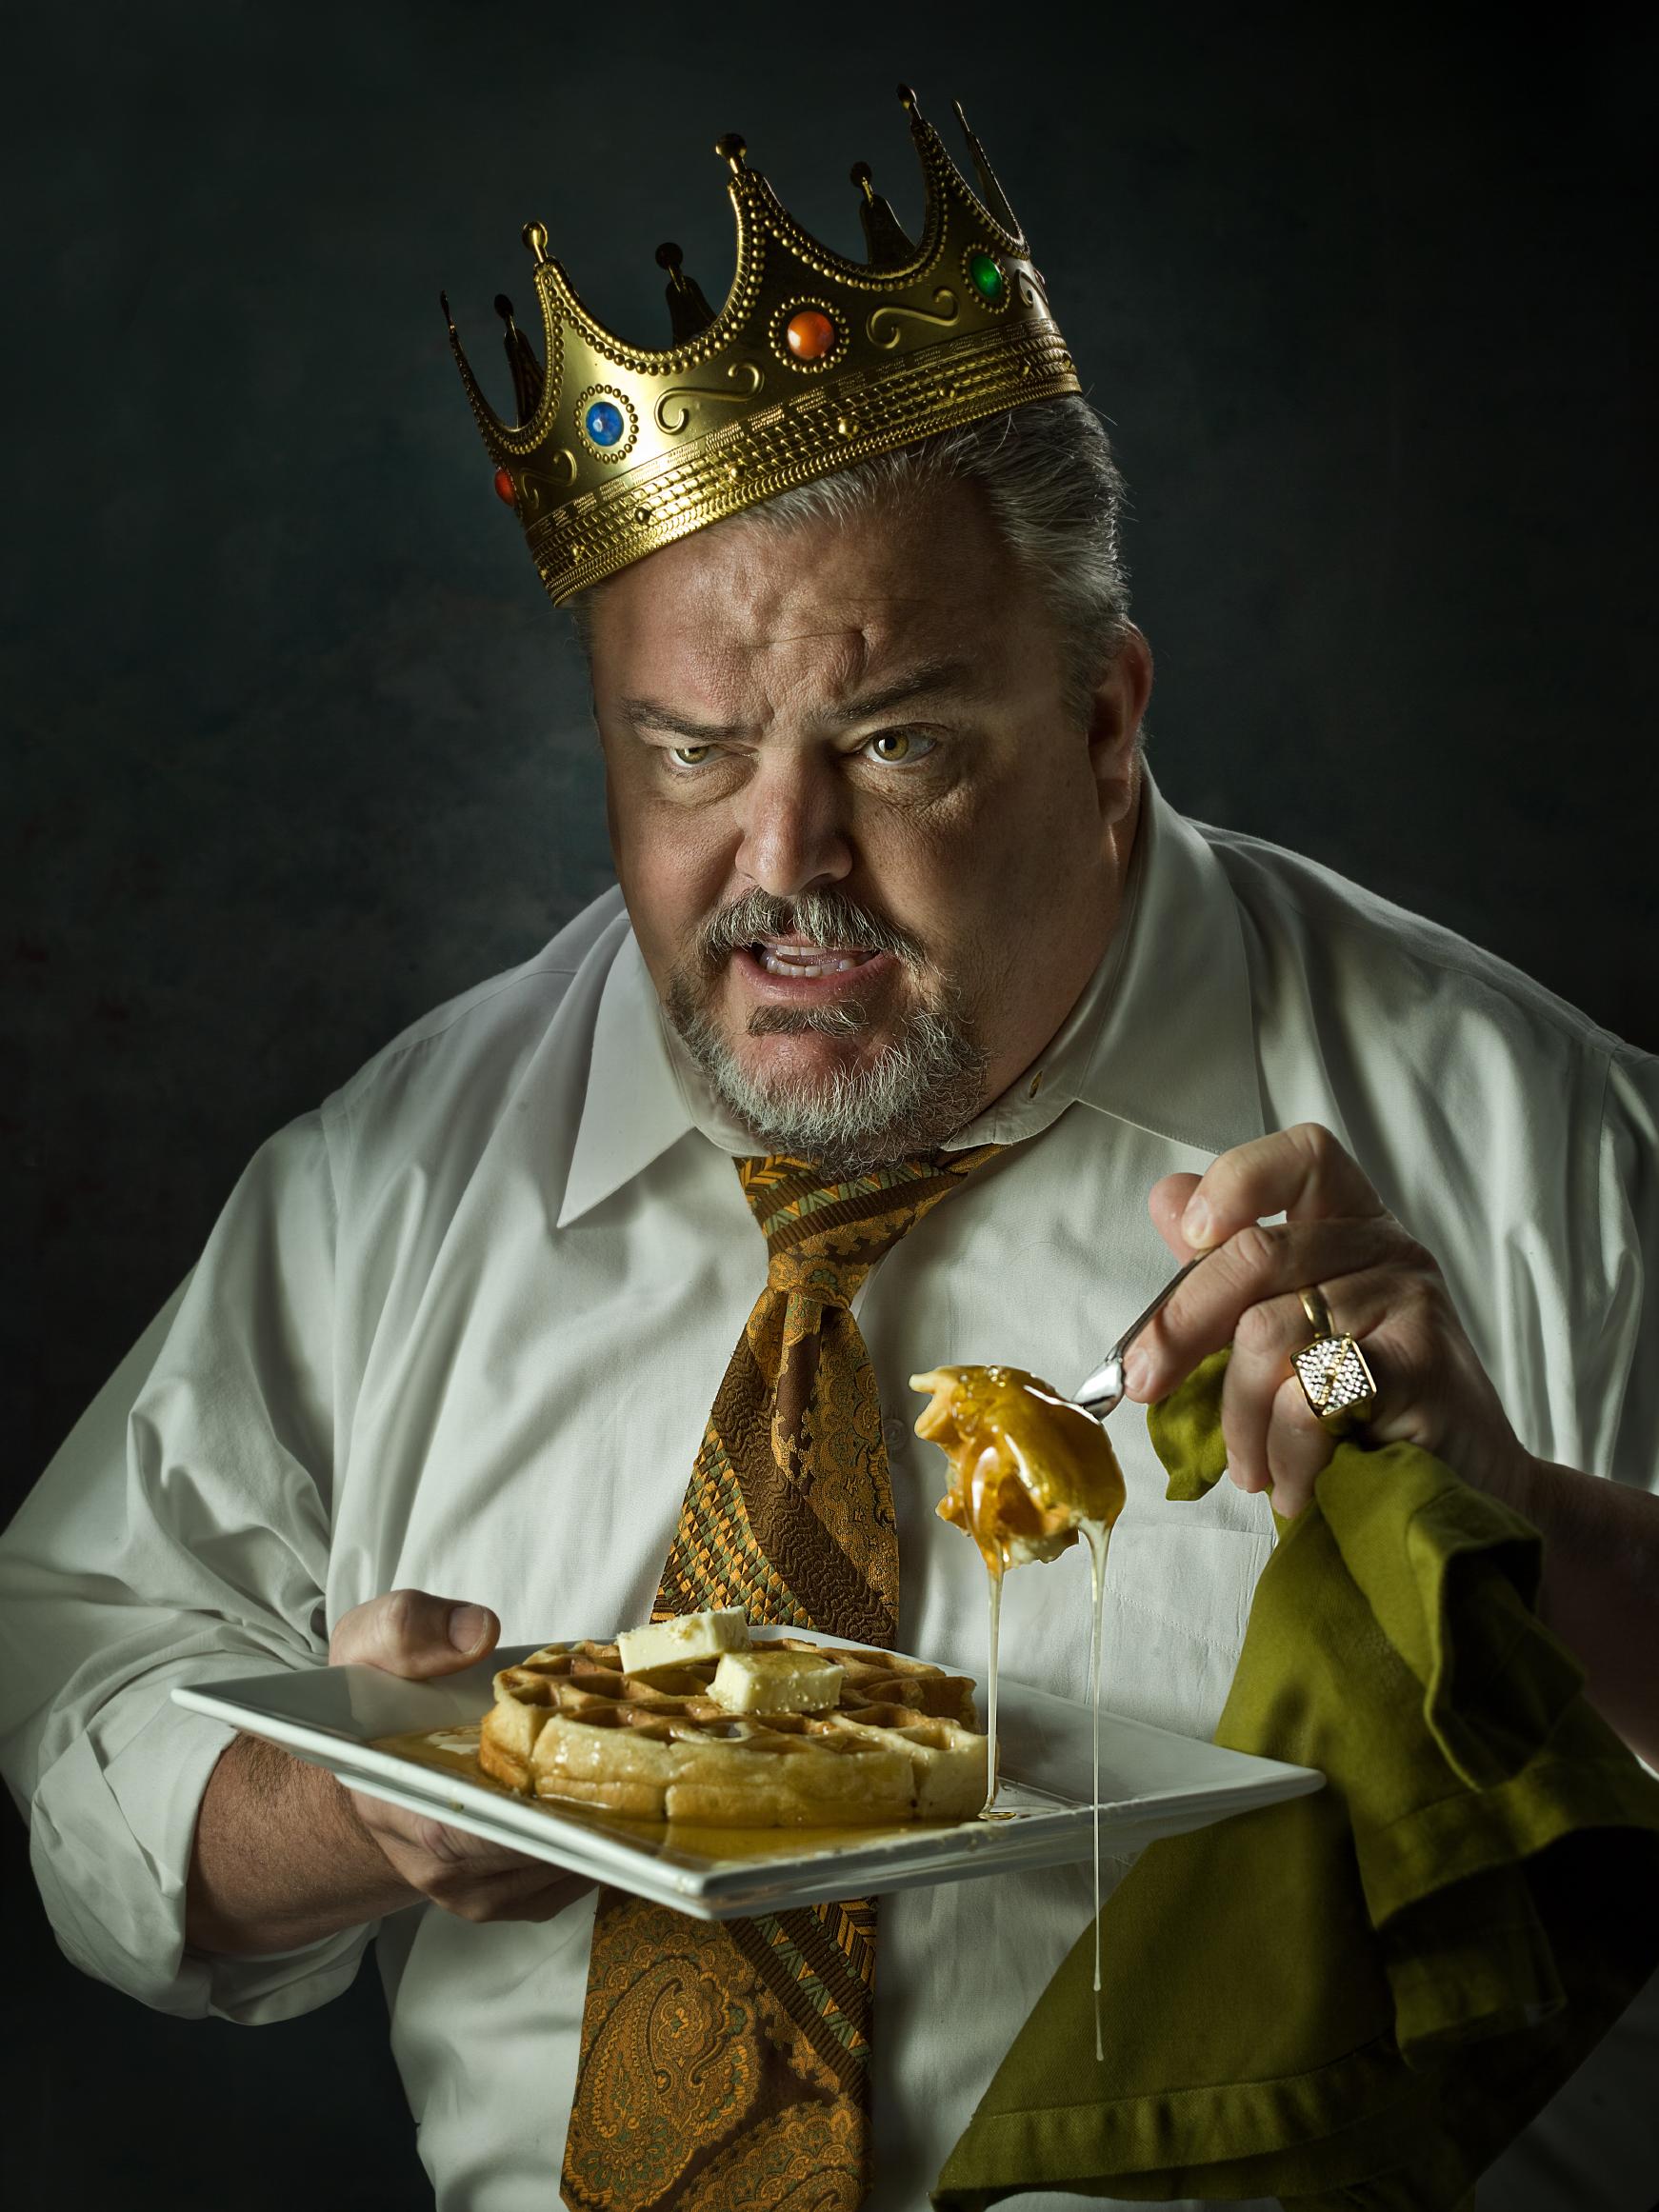 Waffle_0416h350cRs-WEB.jpg